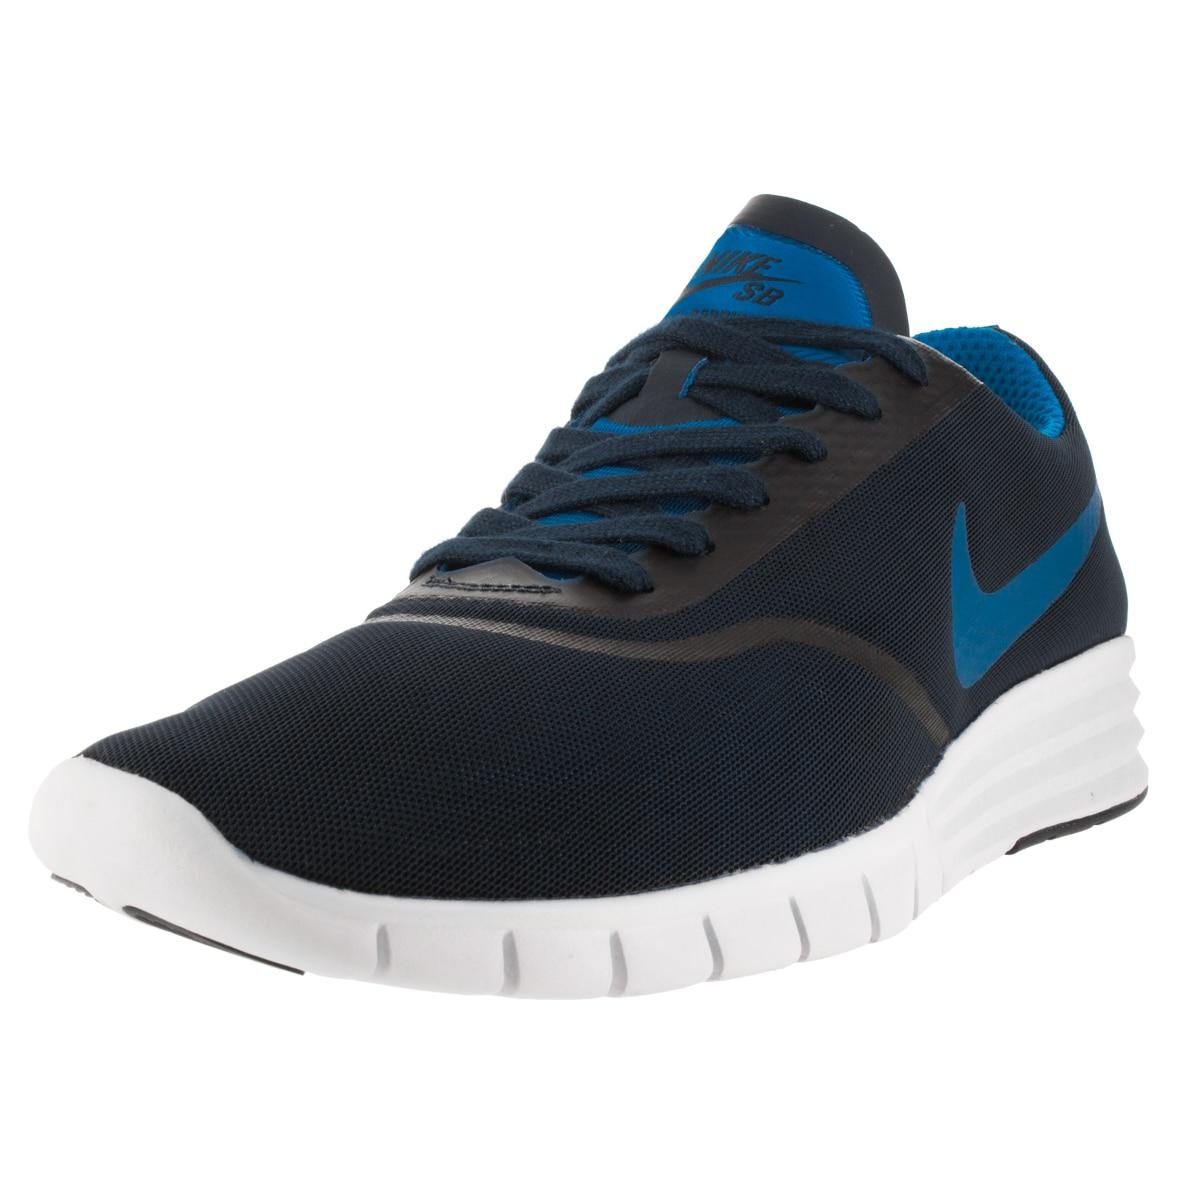 9402ed073f2 Nike Men s Sb Lunar Paul Rodriguez 9 Obsidian Photo Blue White Skate Shoe